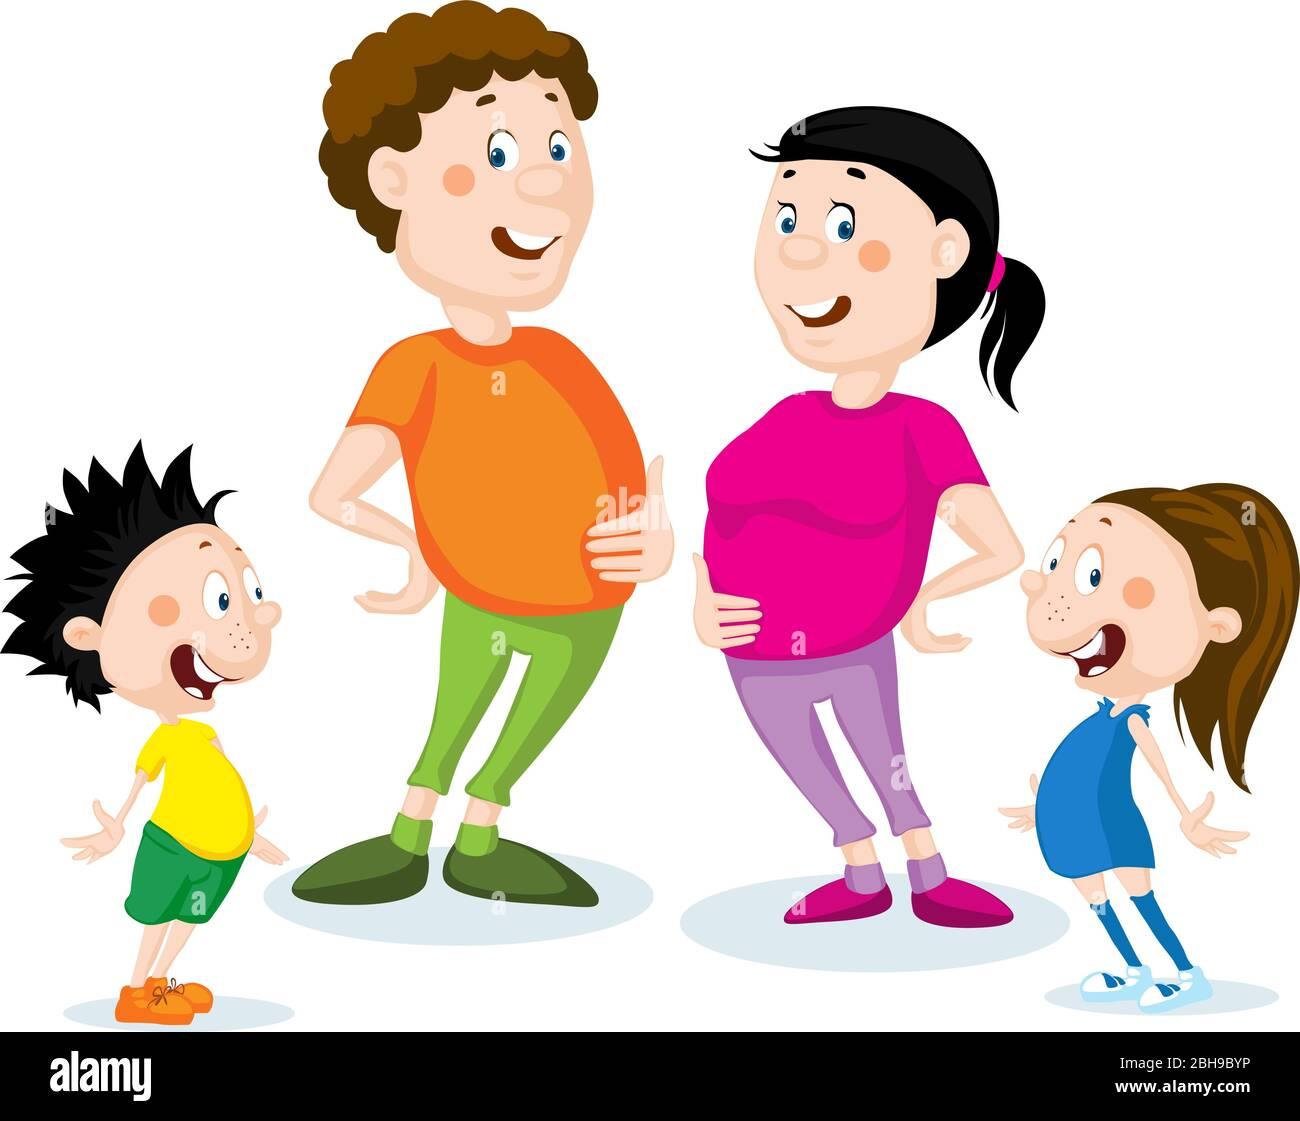 Fat Family Cartoon Flat Design Illustration Isolated On White Stock Vector Image Art Alamy